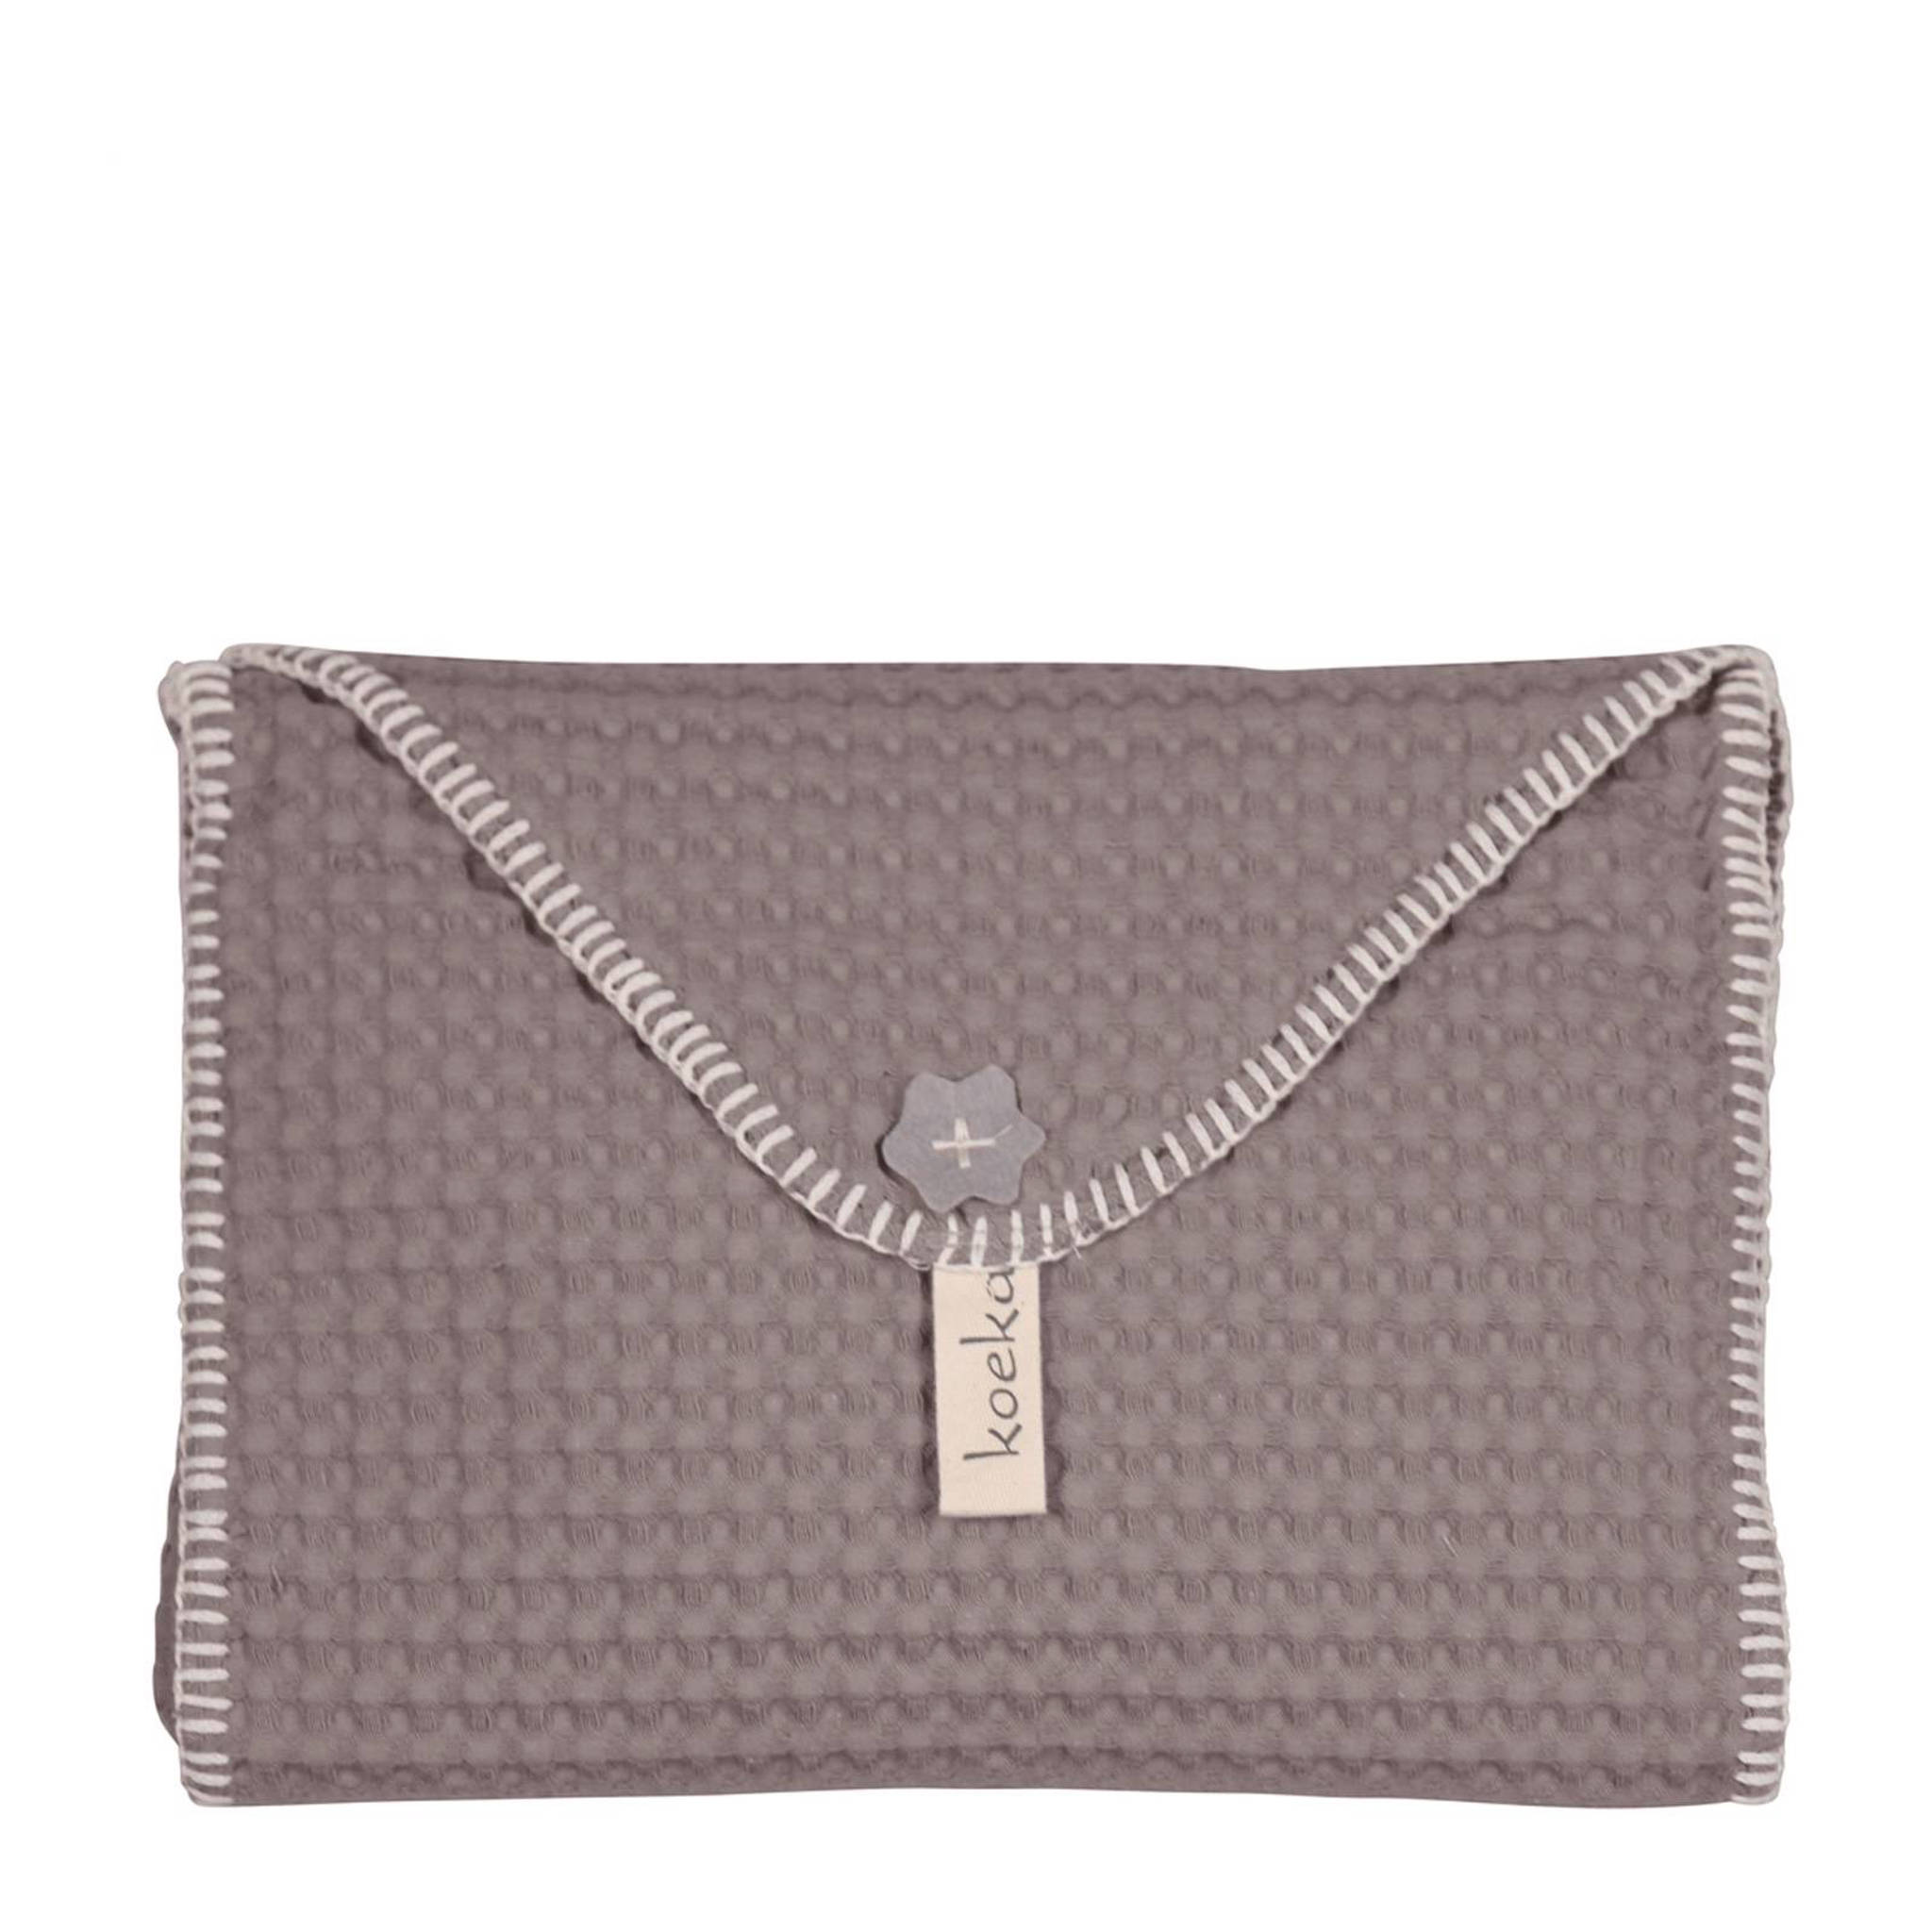 5ba55ab58b0 baby purse extra Antwerp luieretui taupe